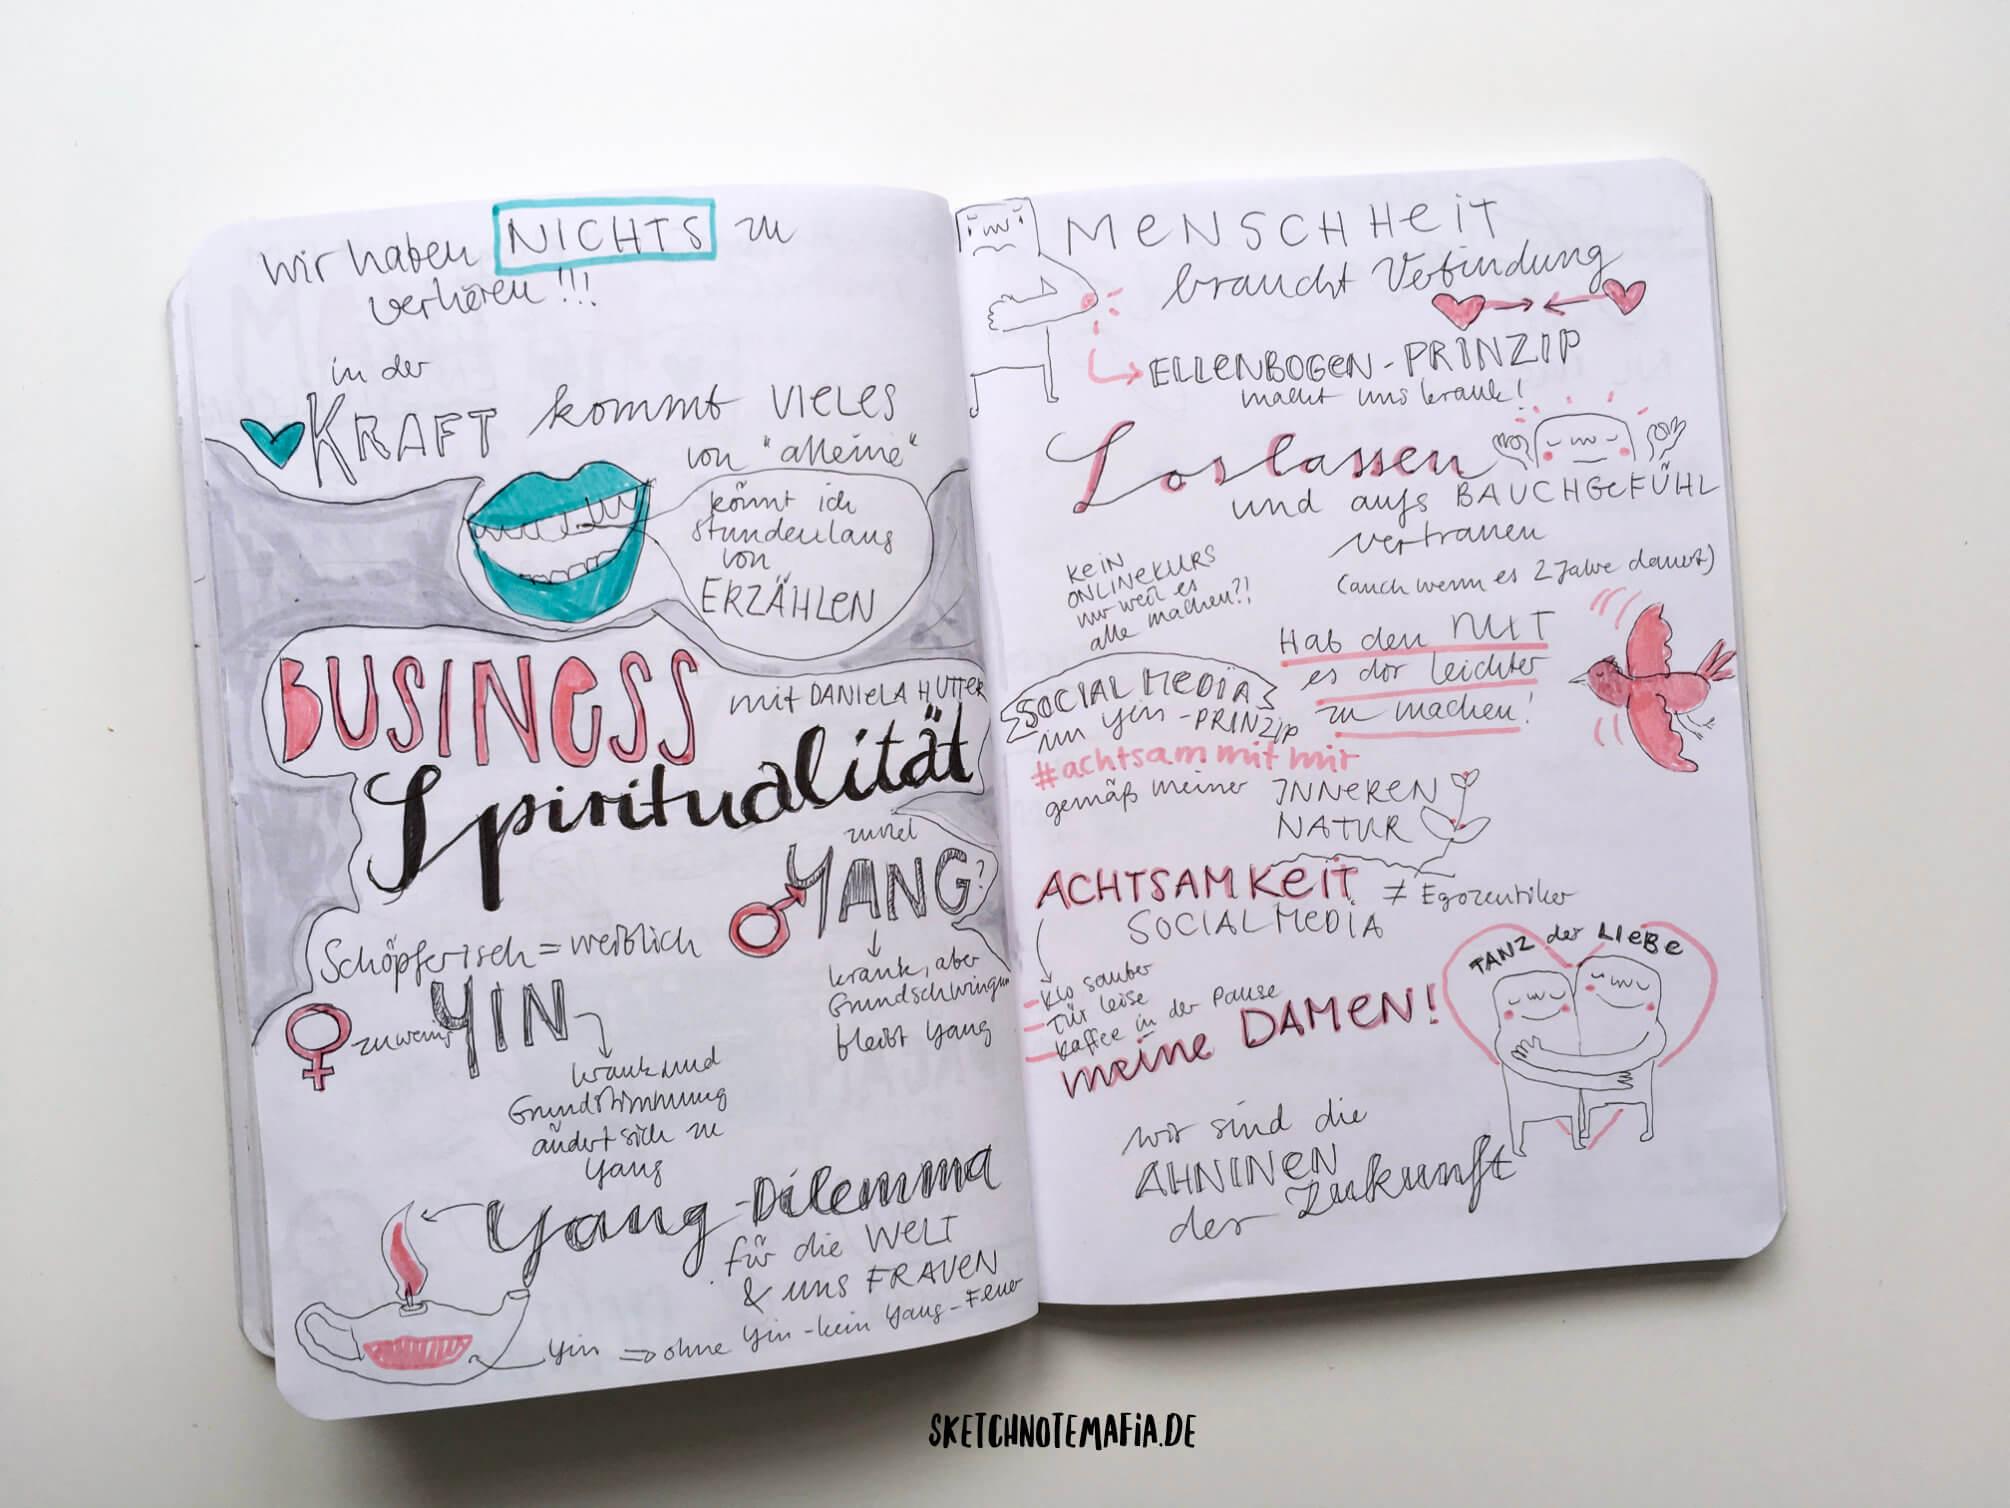 Mindful Blogging Conference - Business Spiritualität